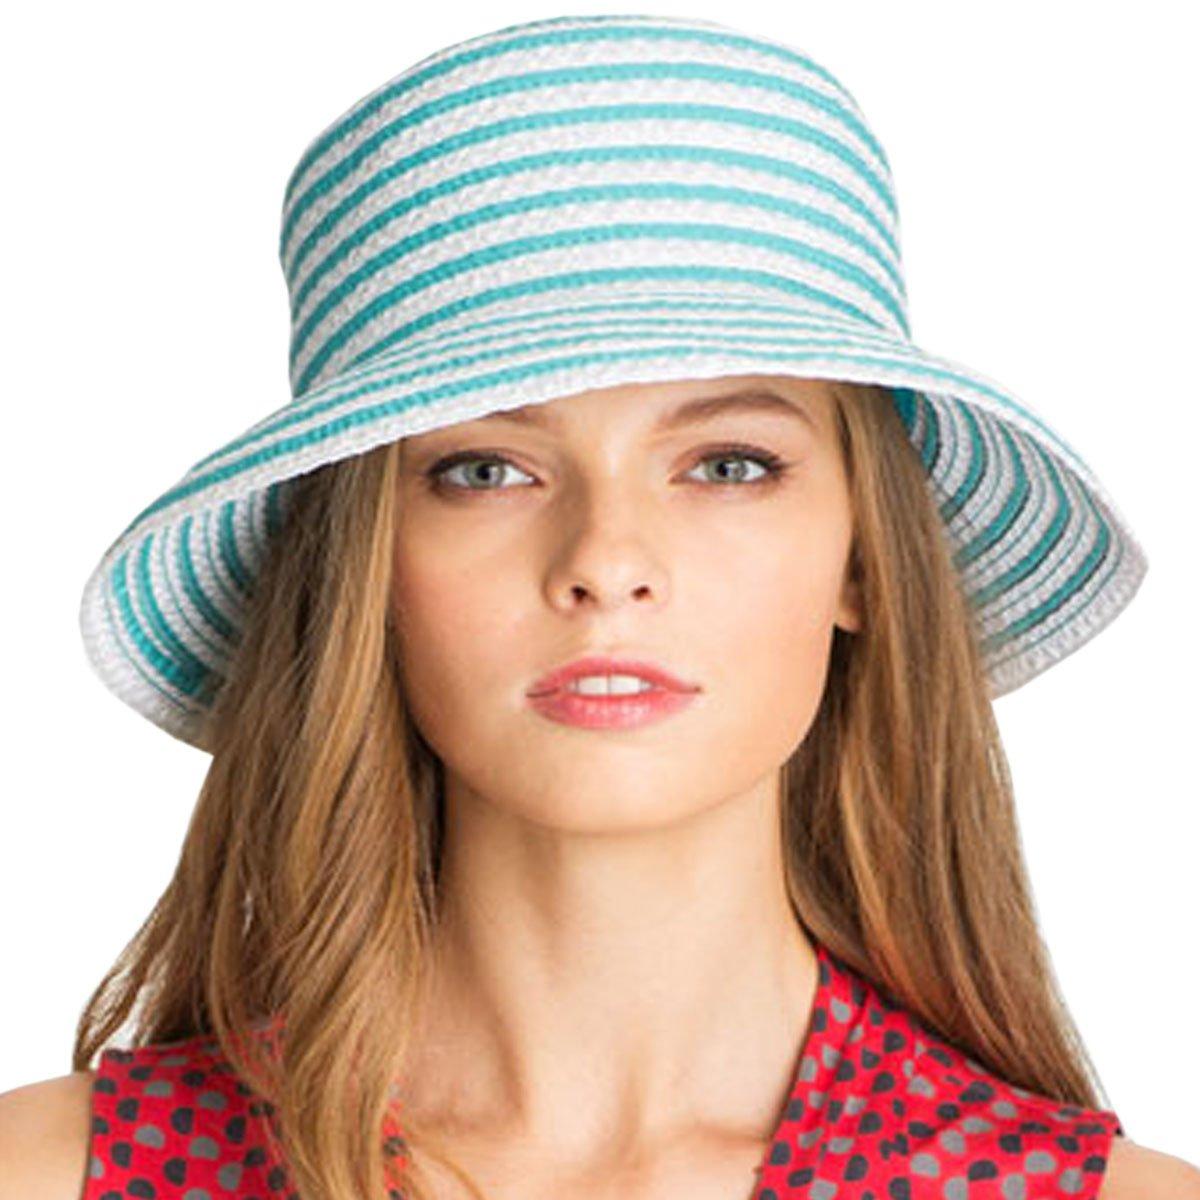 Eric Javits Luxury Fashion Designer Women's Headwear Hat - Braid Dame - Turquoise by Eric Javits